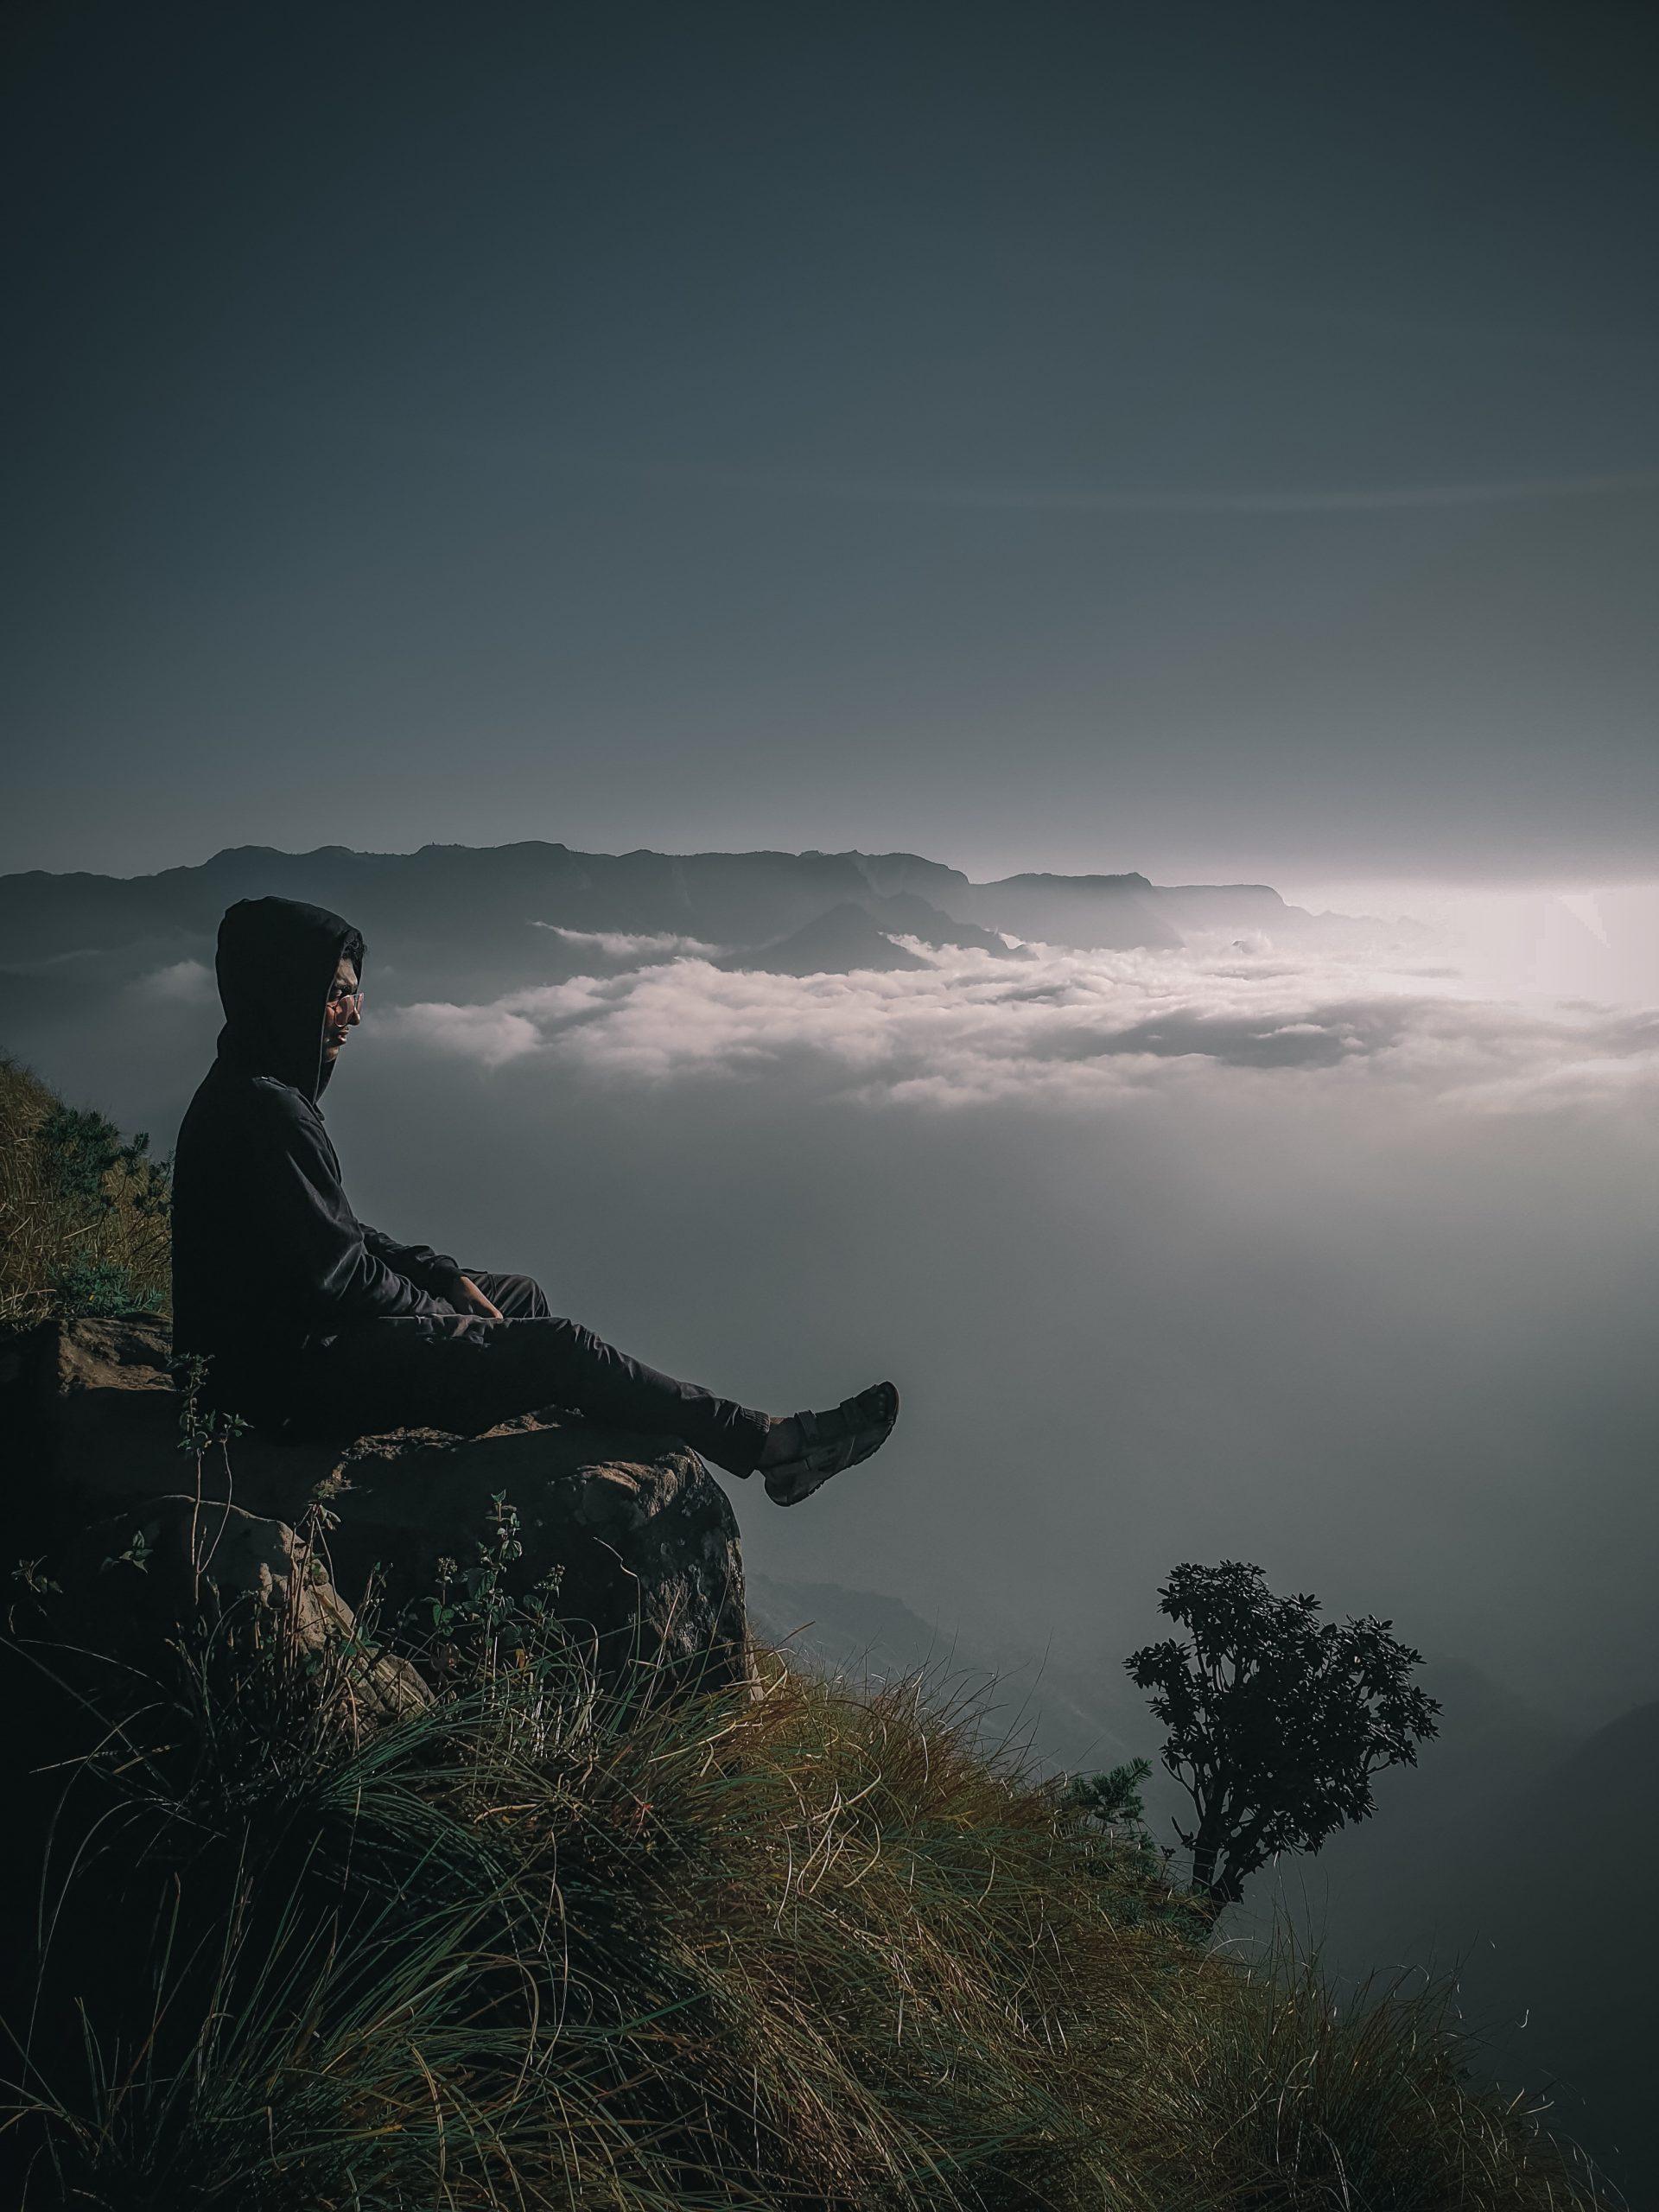 A boy on a cliff